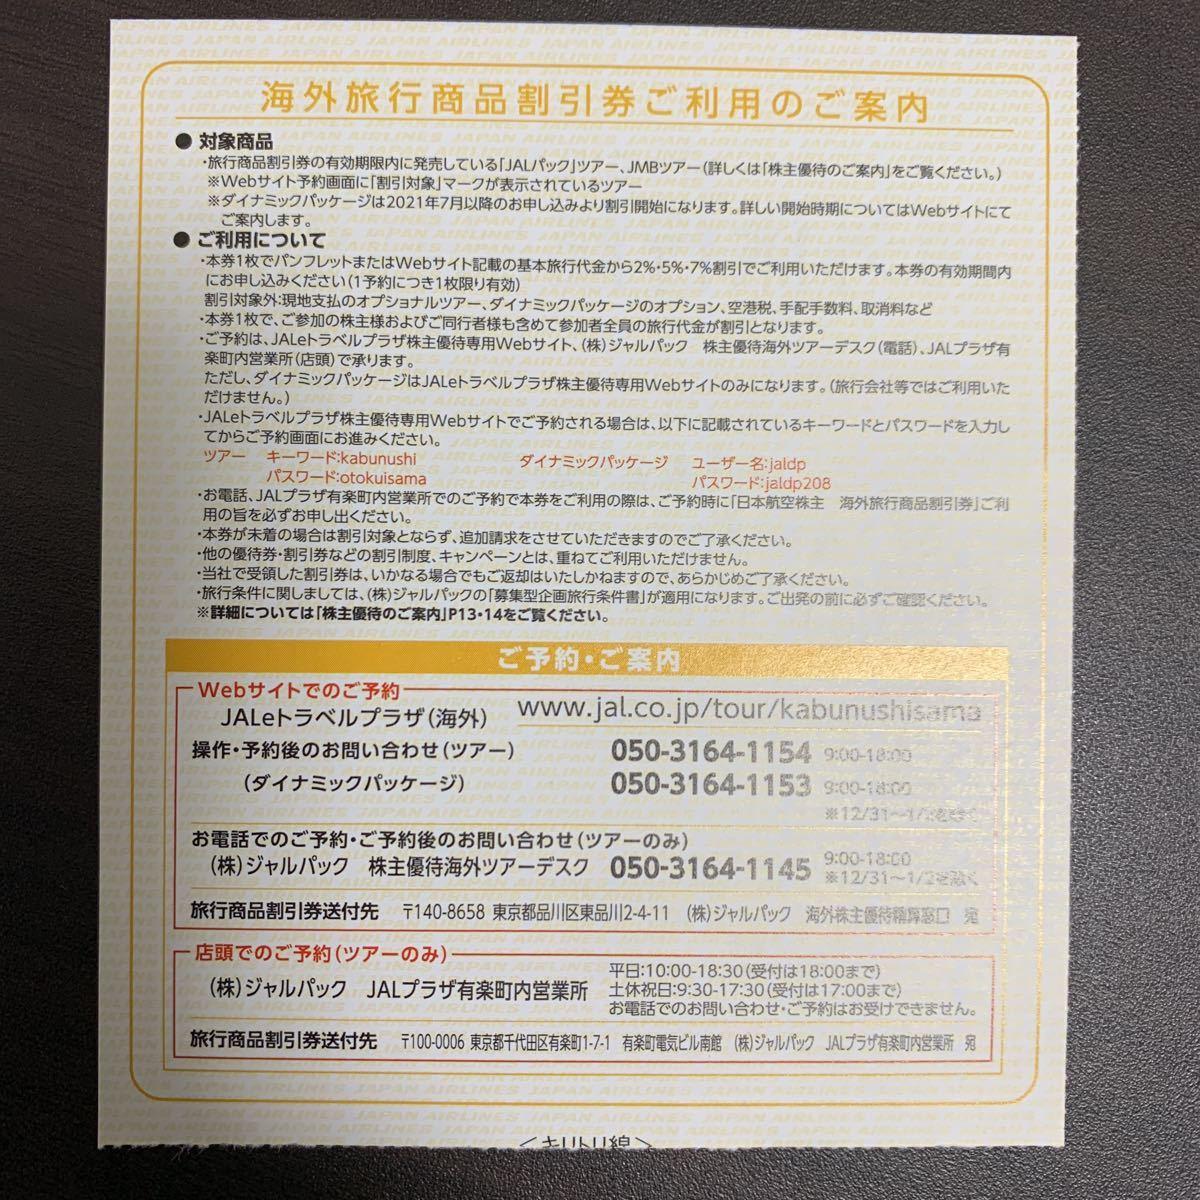 JAL 株主優待 ツアー割引券 計8枚_画像3